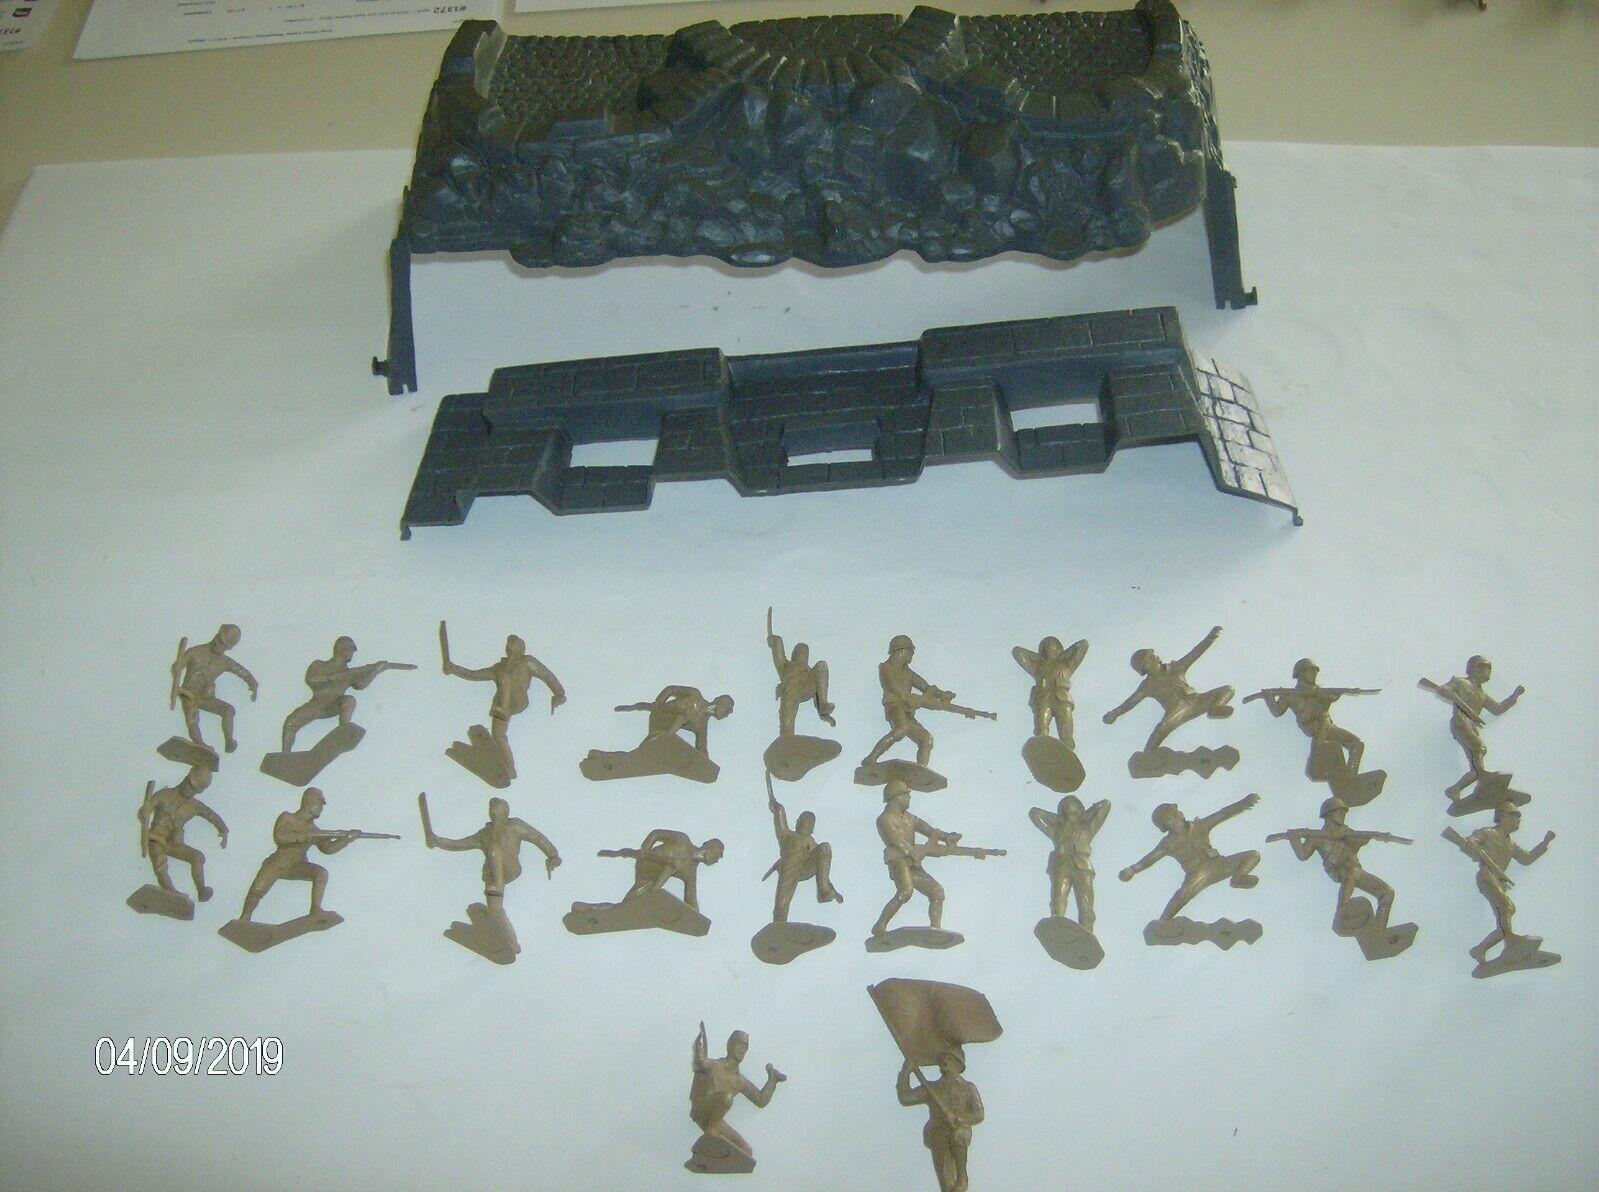 Japan Block hus Iwo Jima 1 32 Skala MPC Blockhus Marx Japanska 22 Figs